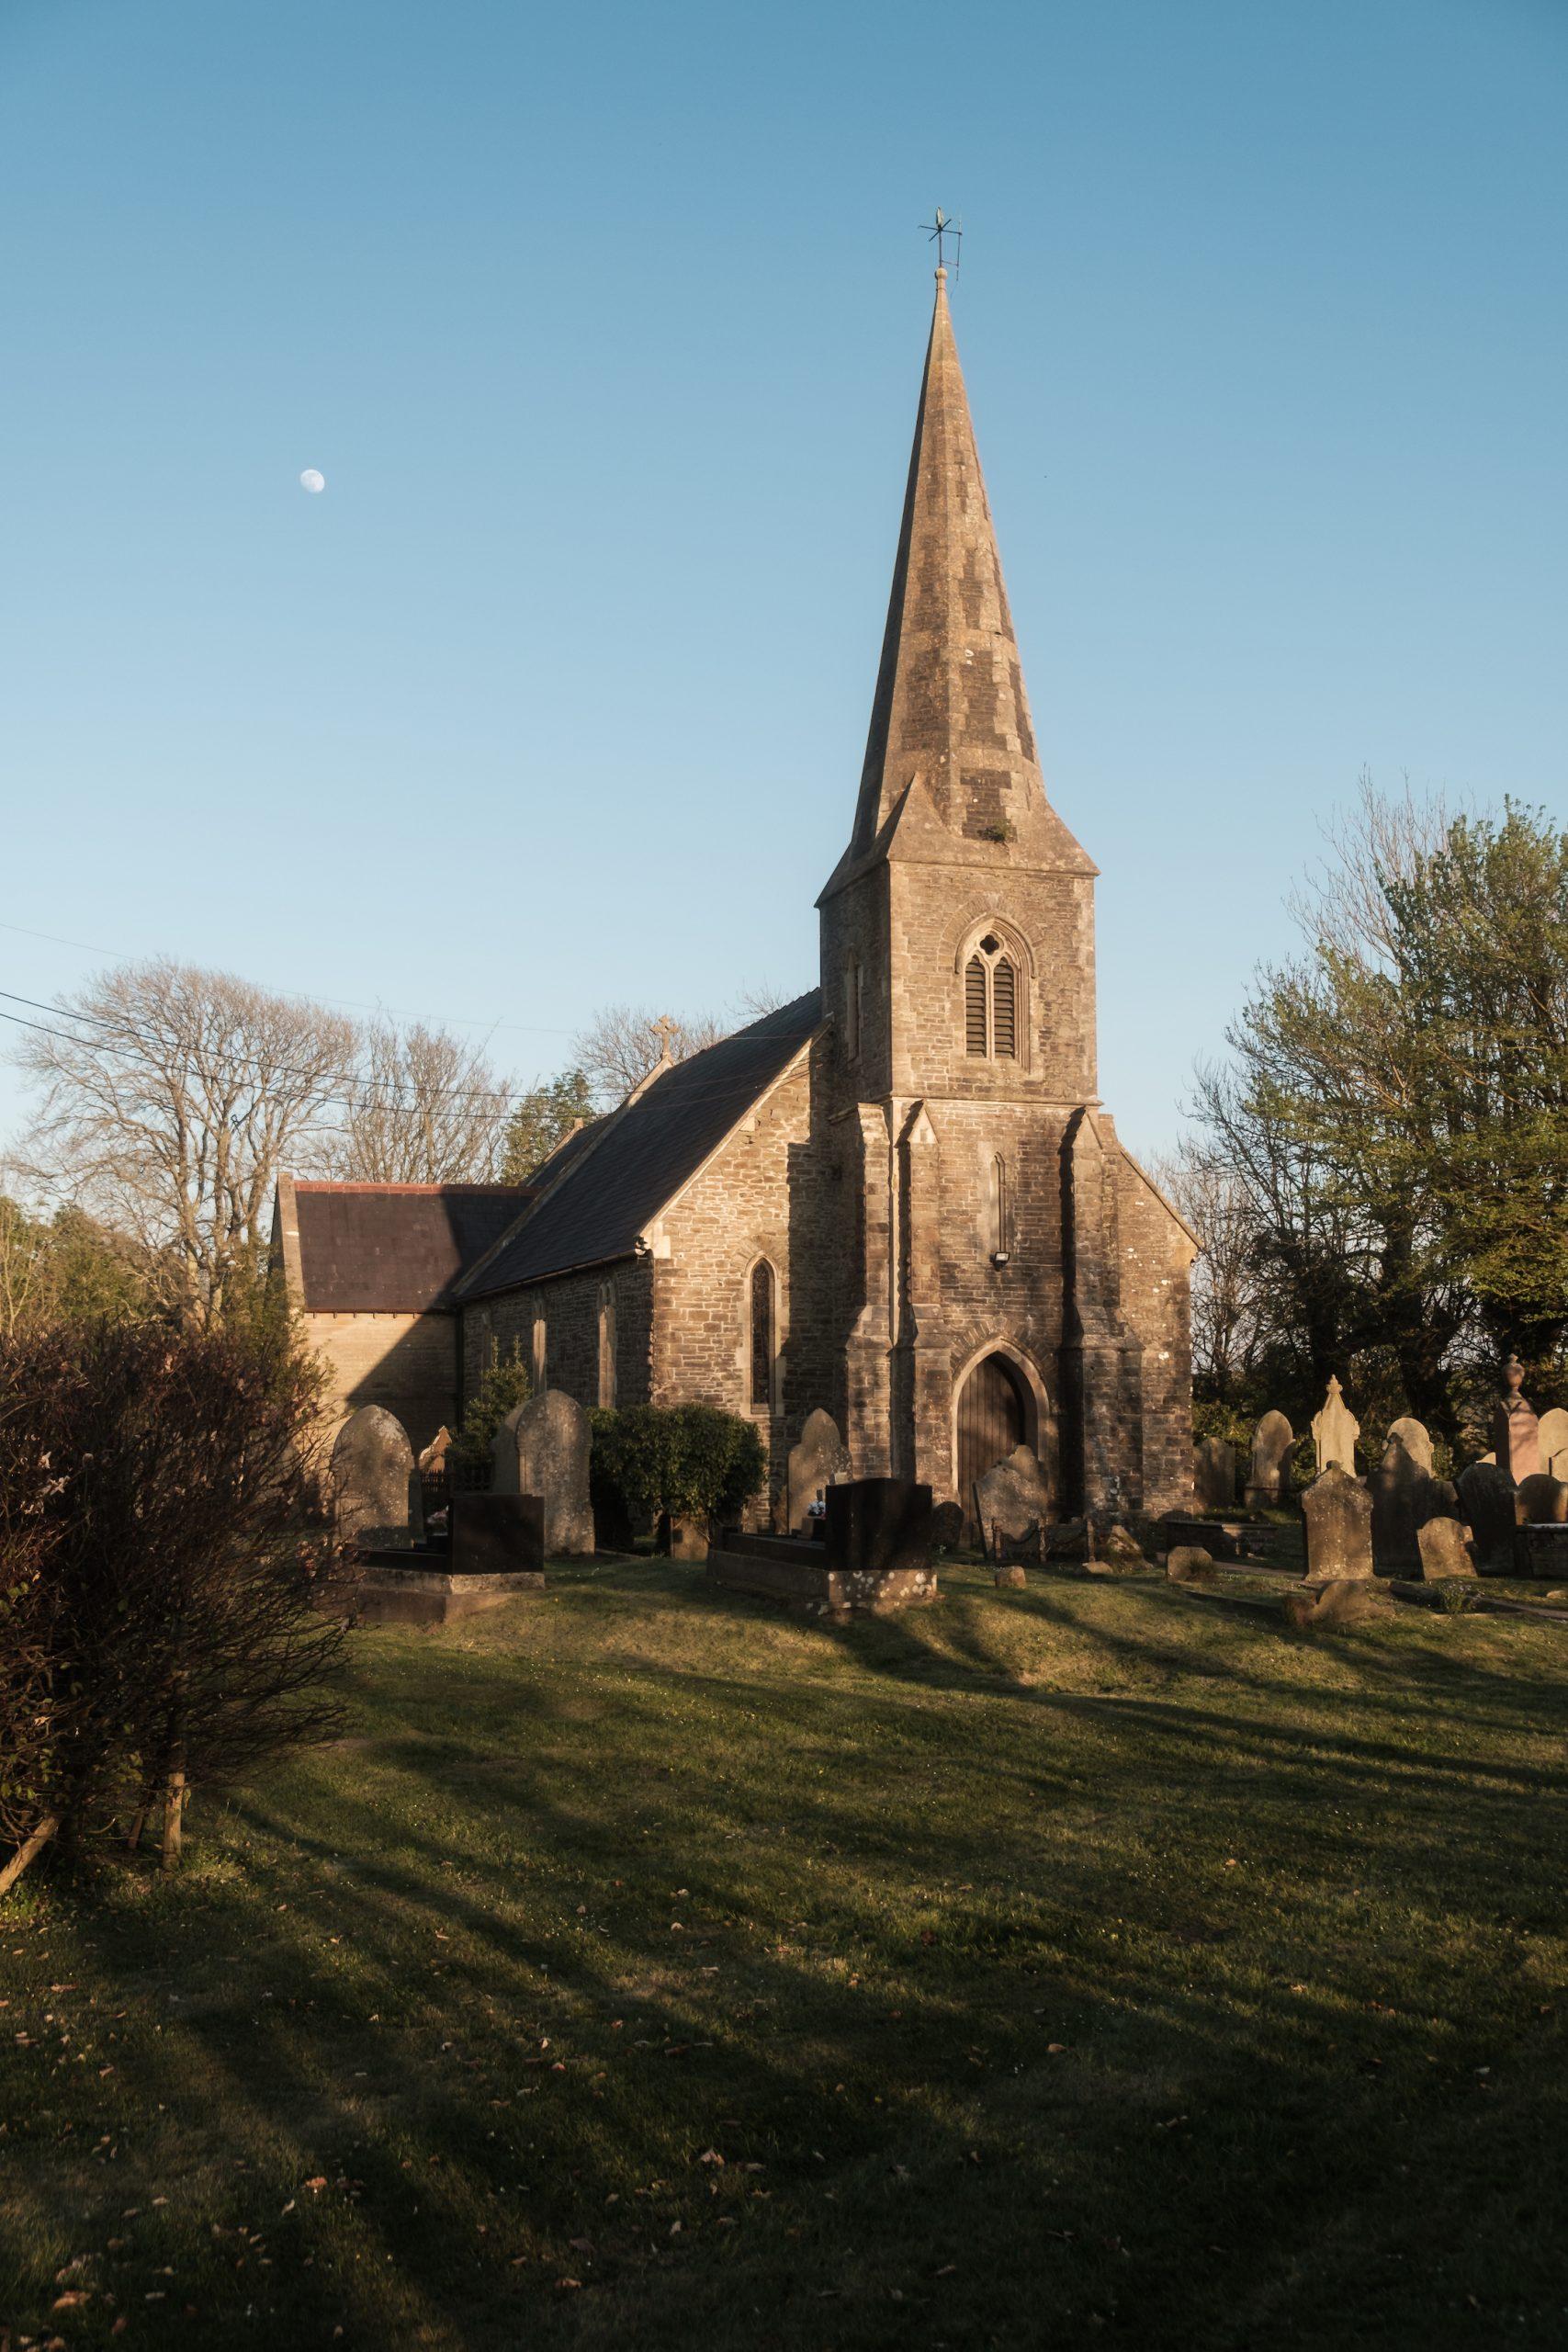 Gone for Good - Saint Gwynour's Church, Penclawdd, Gower : Ben Holbrook13